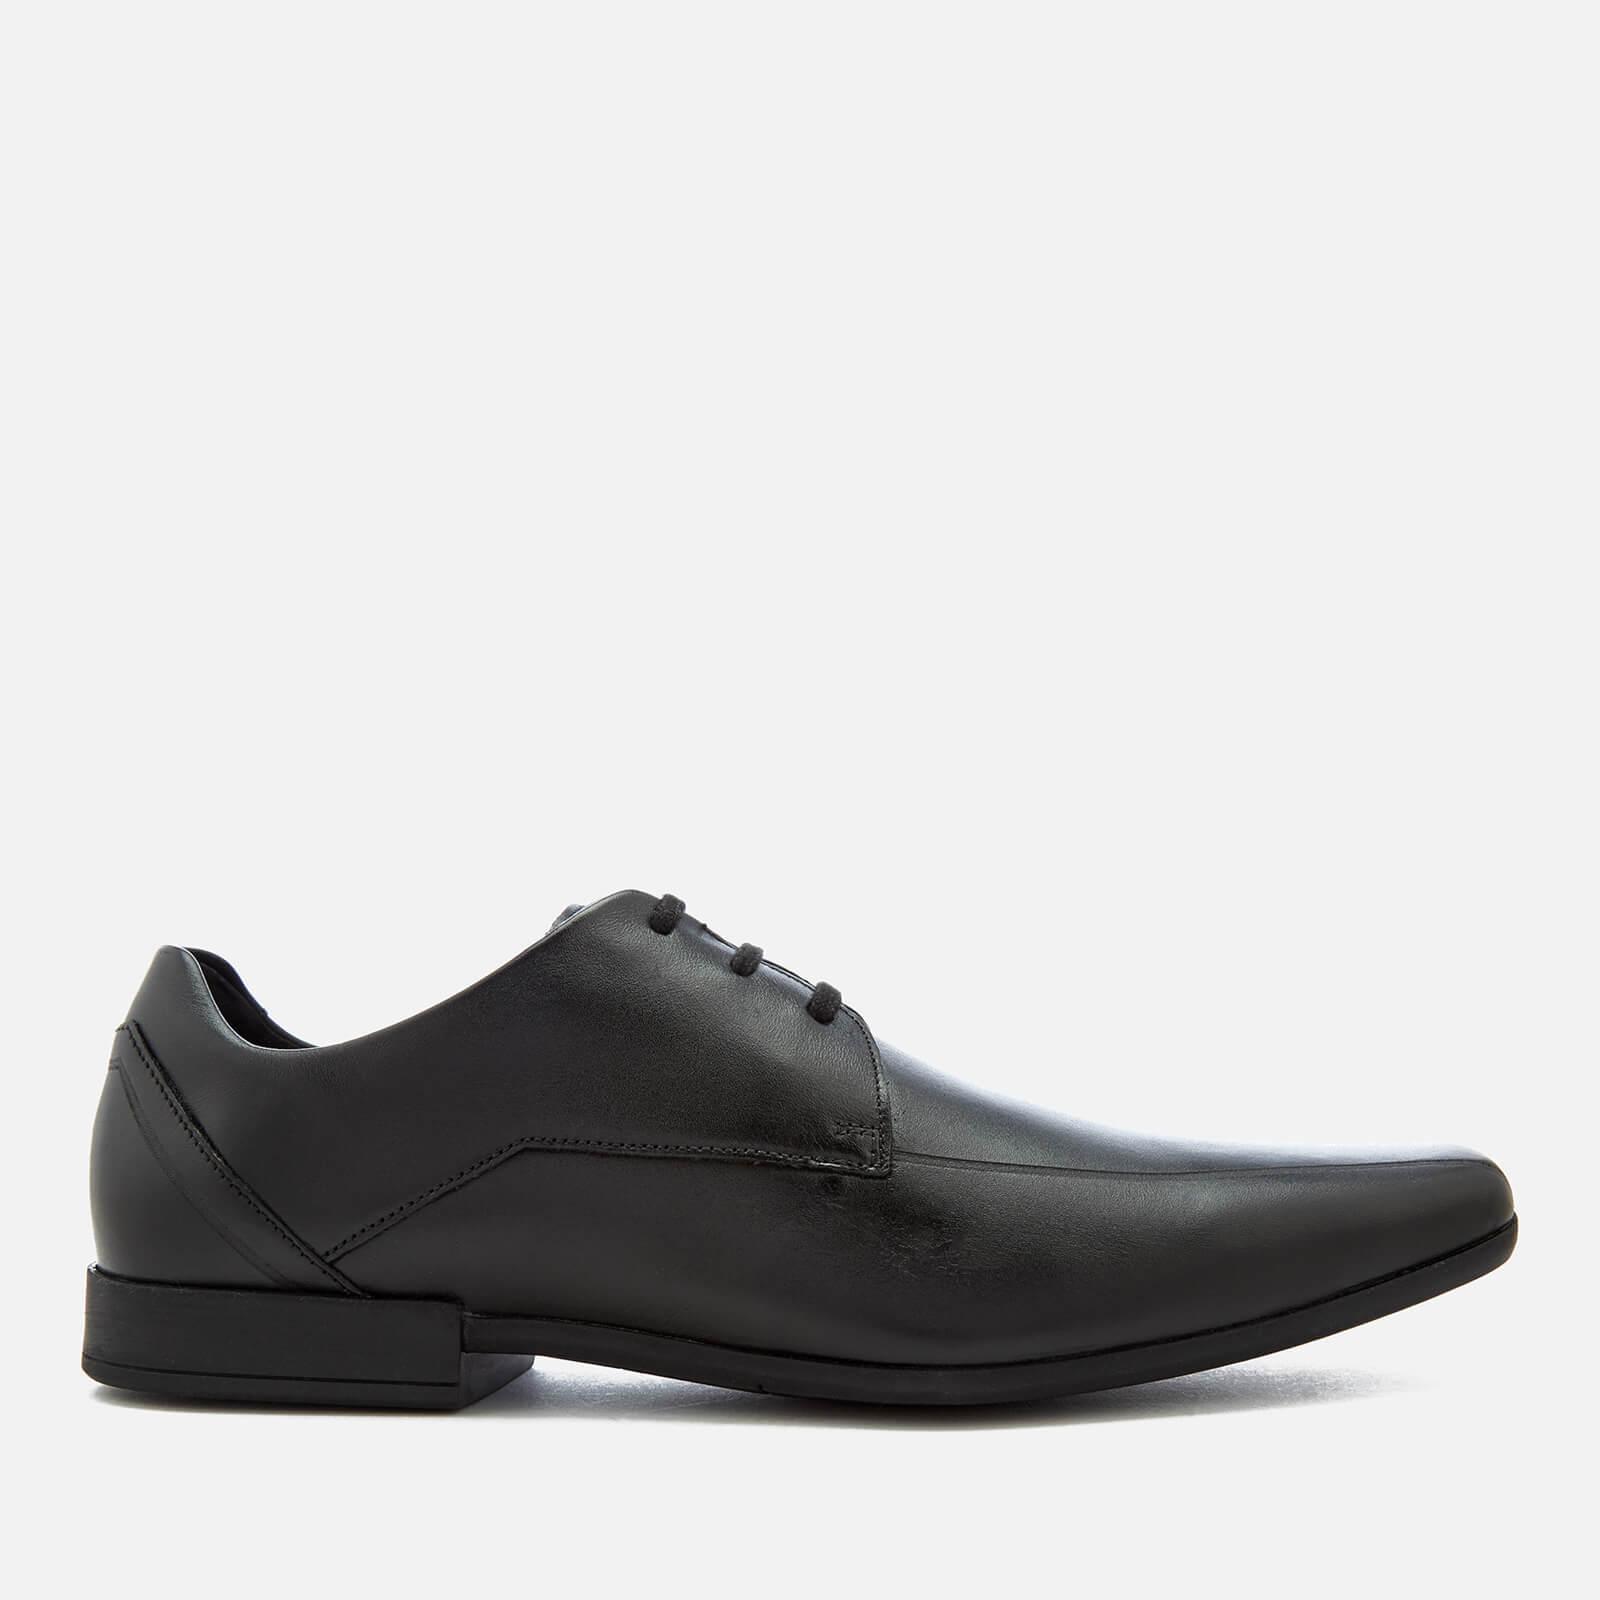 Clarks Men's Glement Over Leather Derby Shoes - Black - UK 7